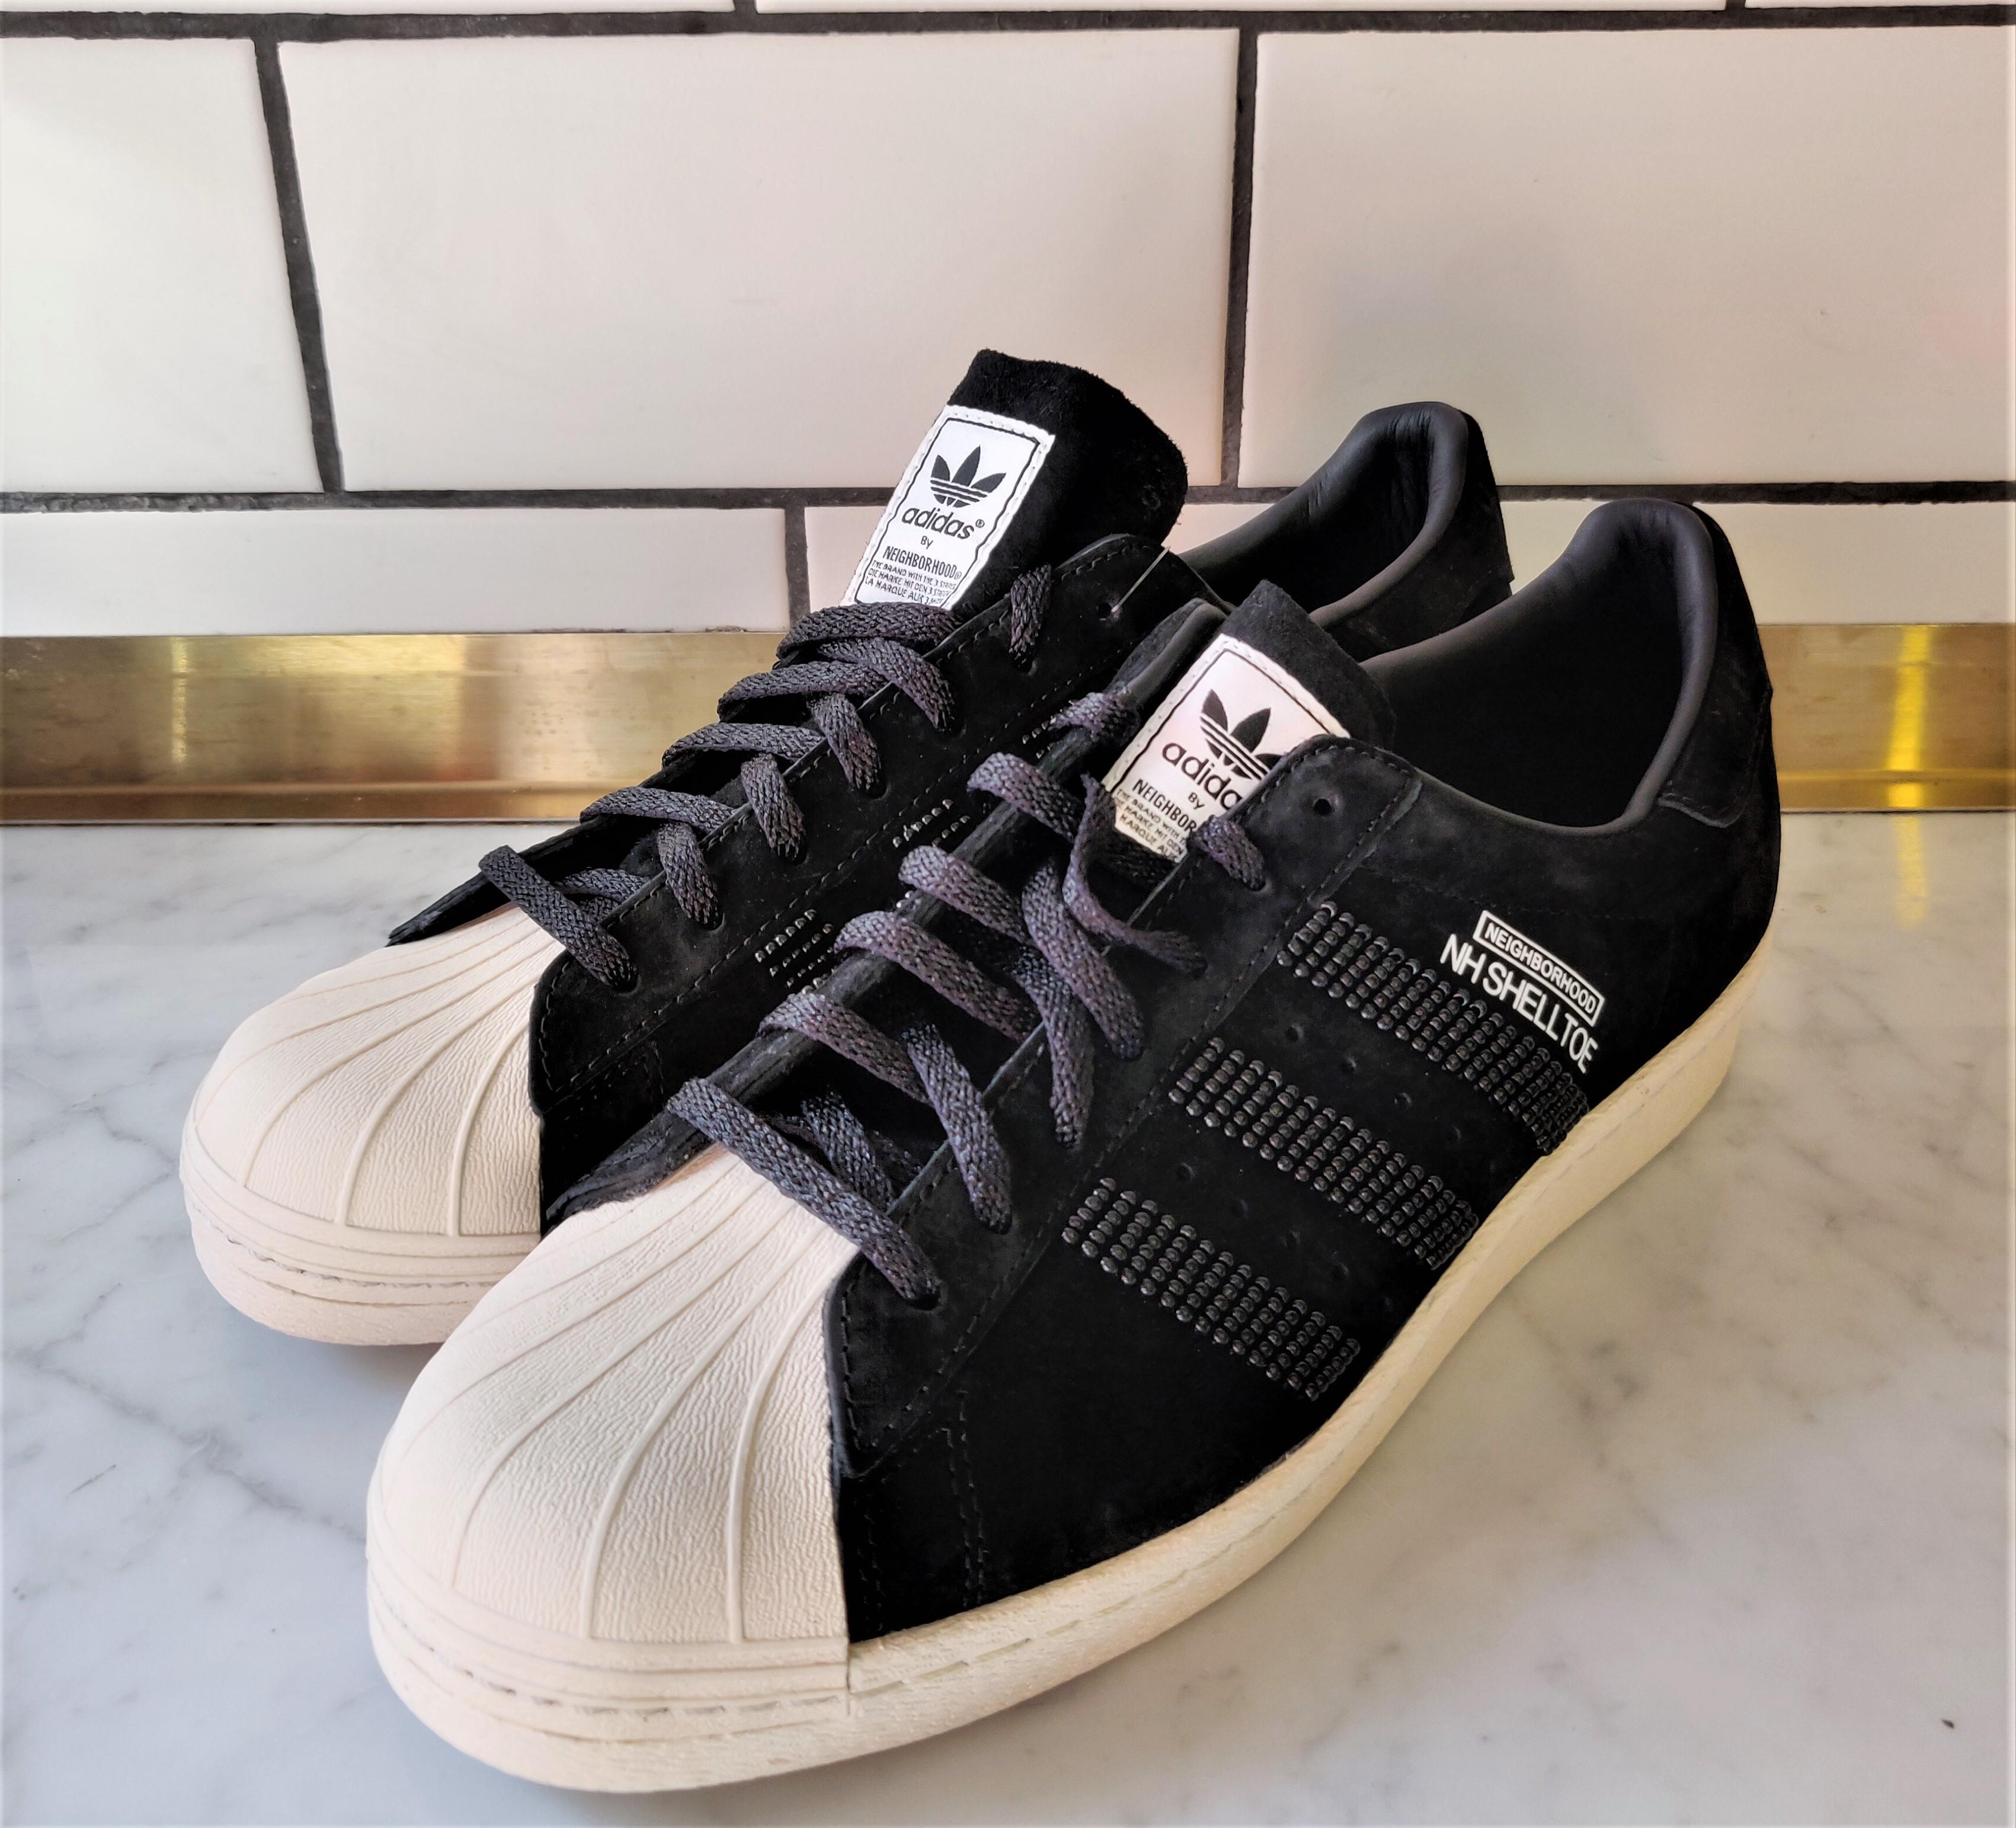 Adidas superstar Nh Shelltoe